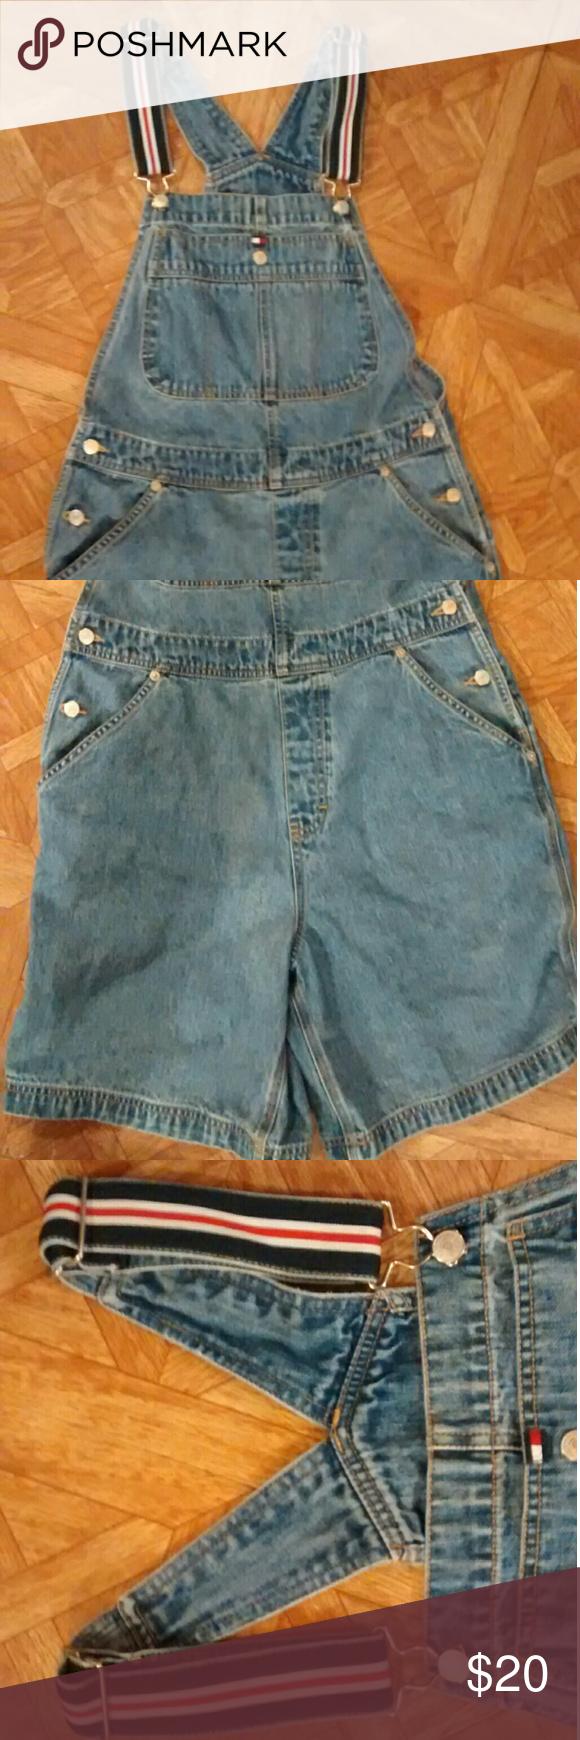 "Vintage Tommy Hilfiger denim shorts overalls Vintage denim shorts overalls. Clean. I'm great condition! Waist measures 33"" inseam 7.5"". Size medium. Tommy Hilfiger Jeans Overalls"